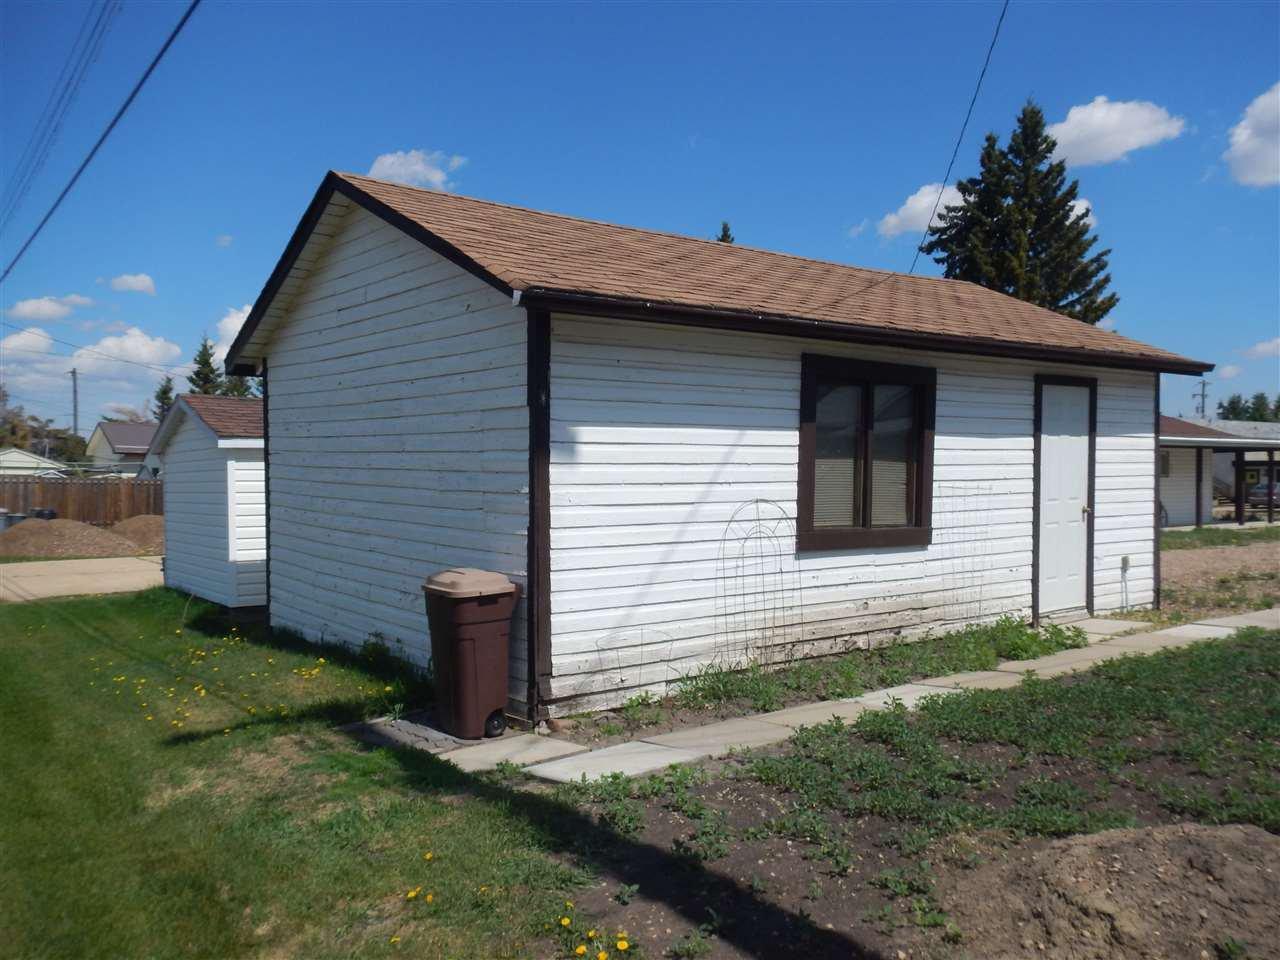 Photo 6: Photos: 5120 48 Street: Waskatenau House for sale : MLS®# E4201146